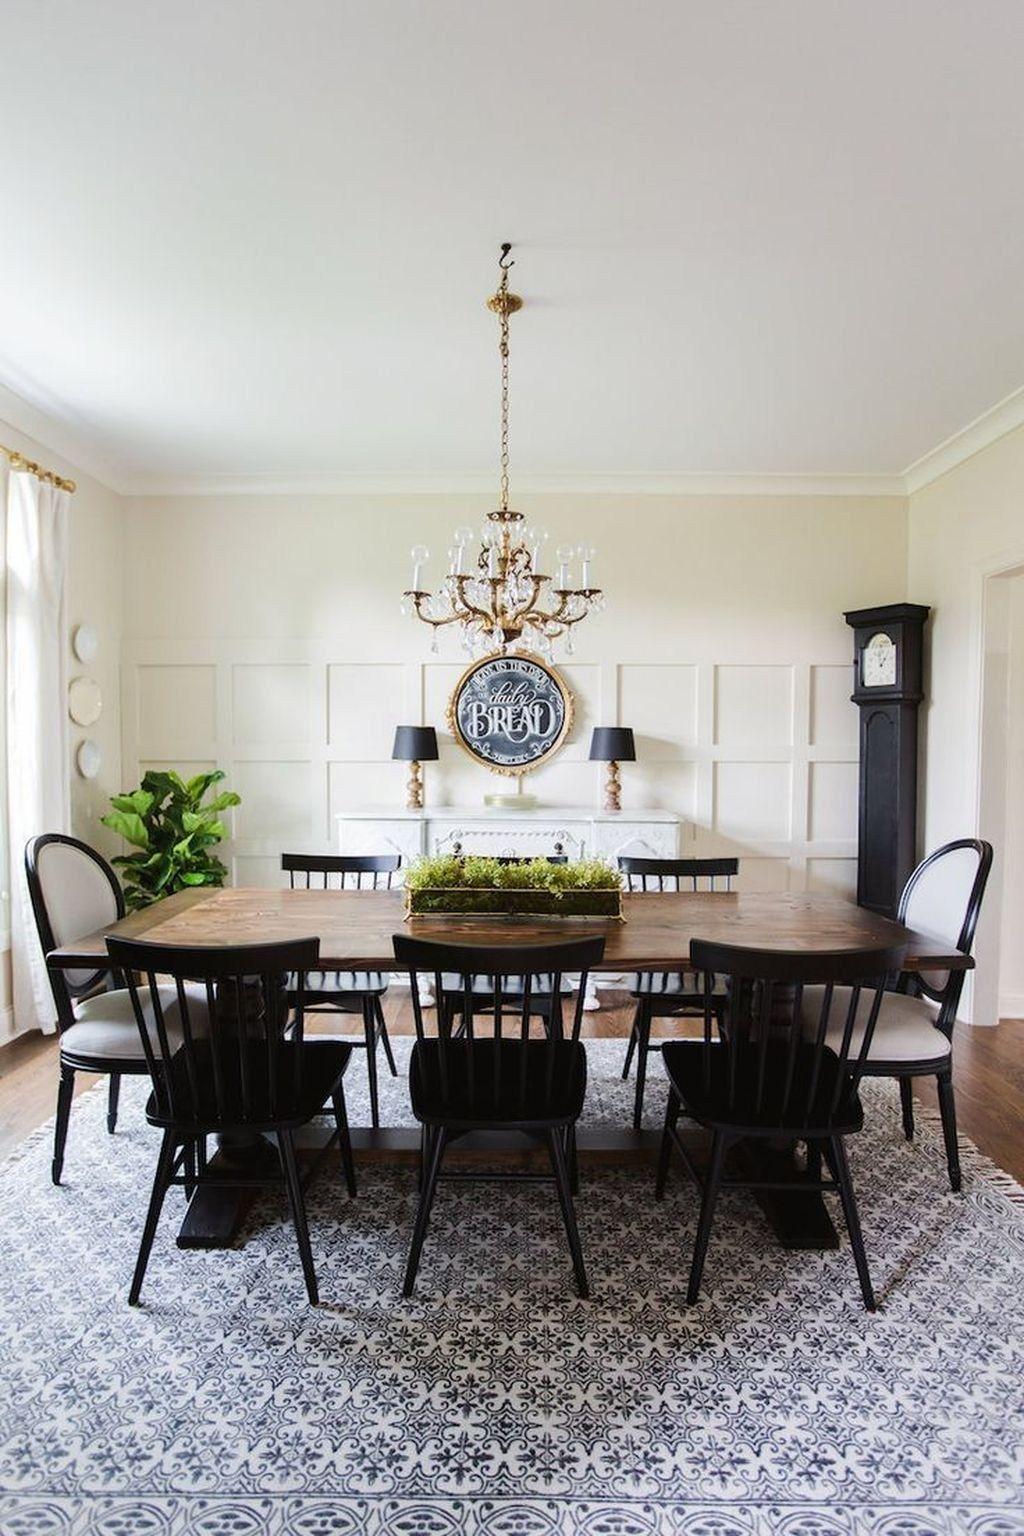 42 Classy Black Dining Room Design Ideas In 2020 Luxury Dining Room Dining Room Remodel Dining Room Design